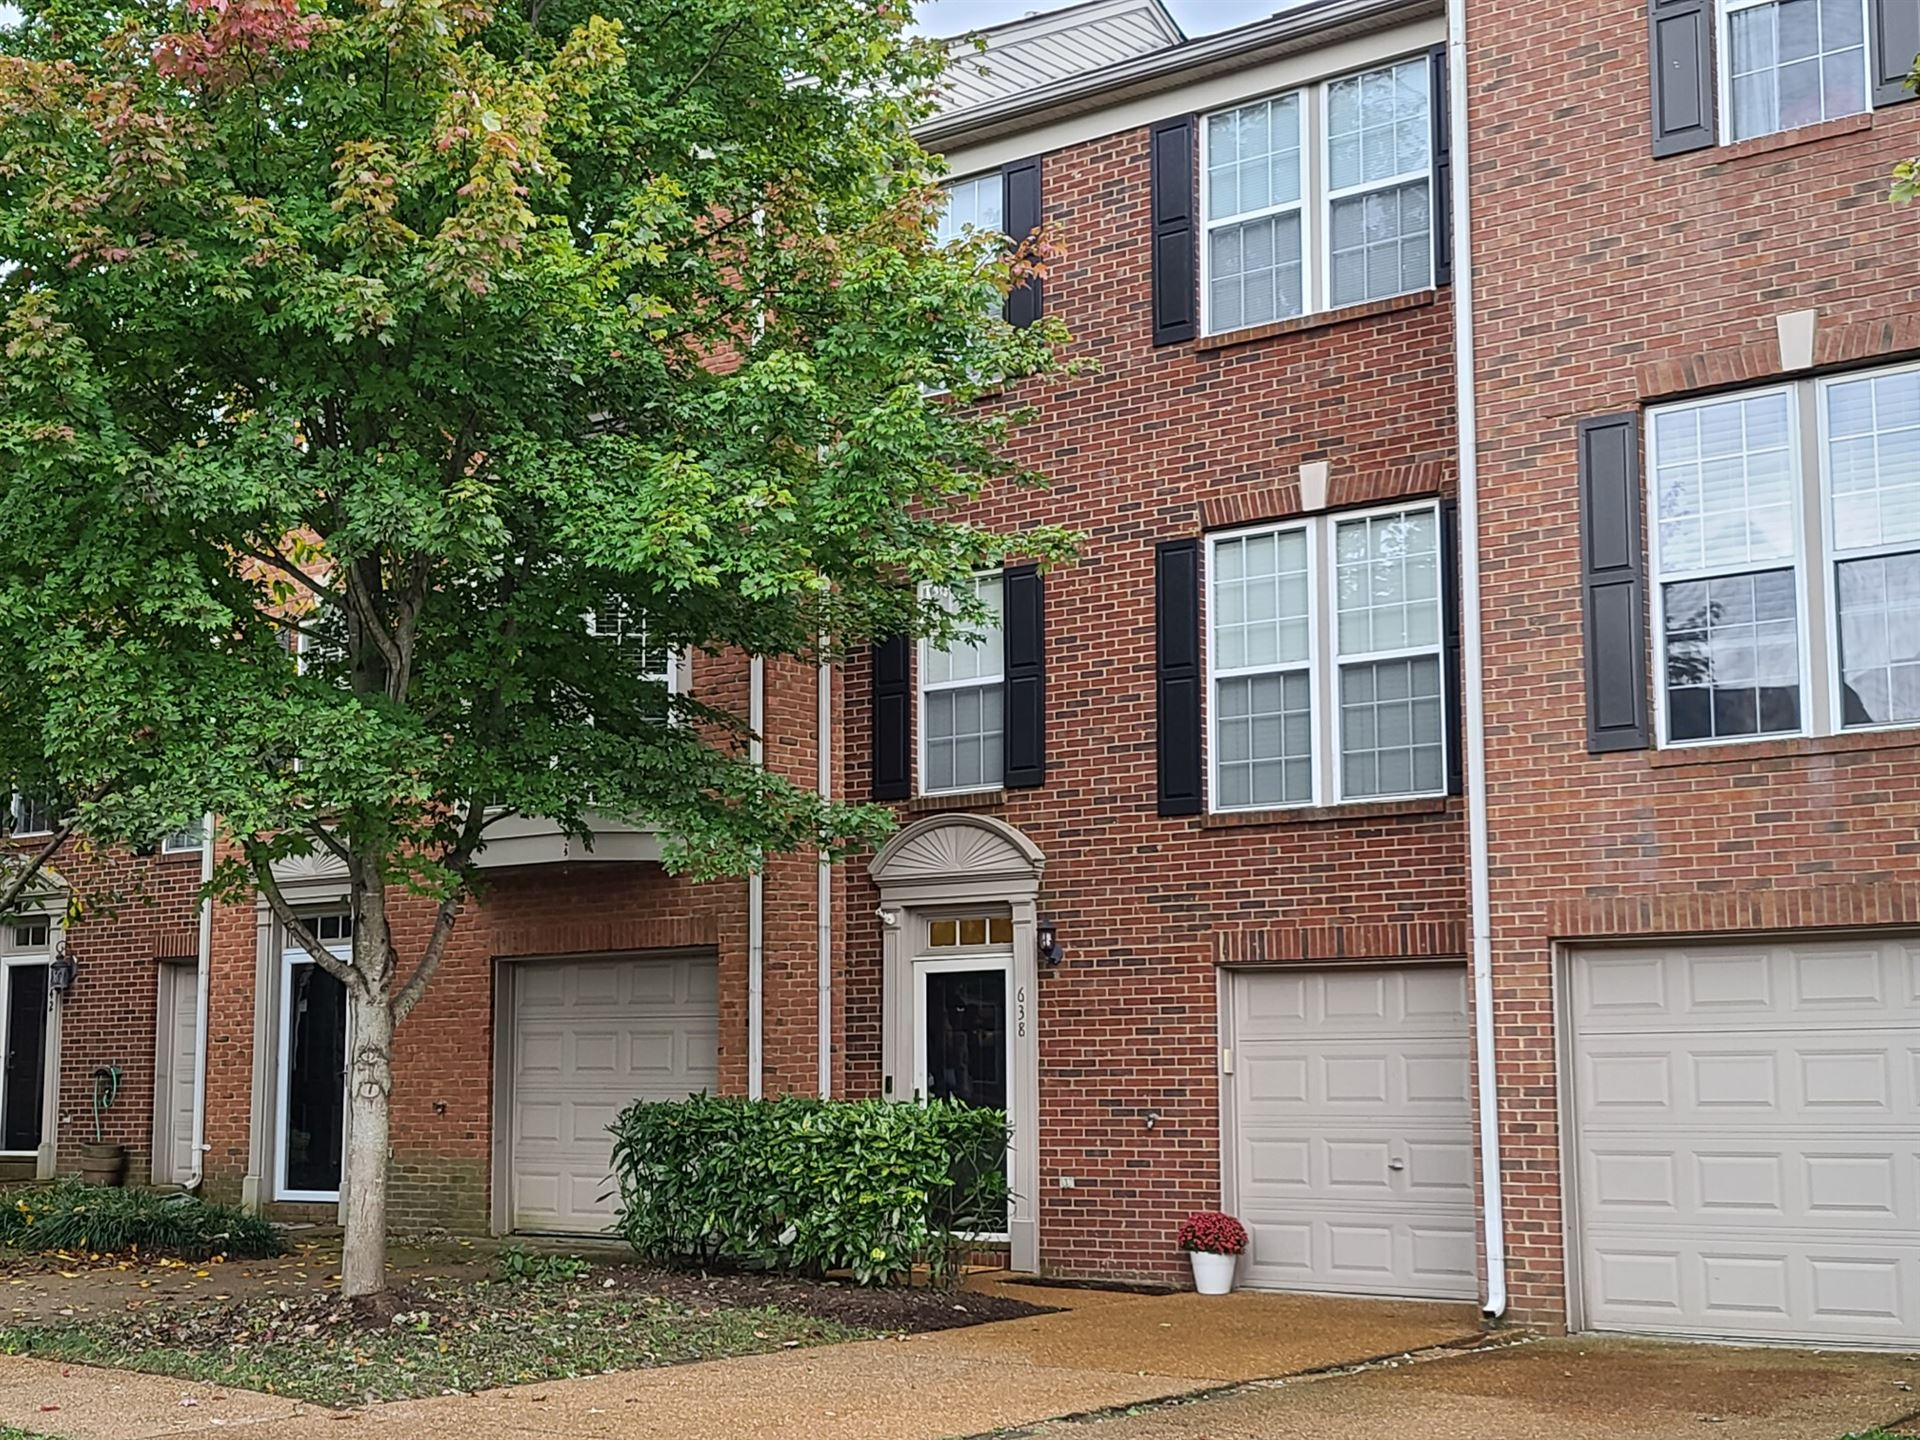 638 Huffine Manor Cir, Franklin, TN 37067 - MLS#: 2297646